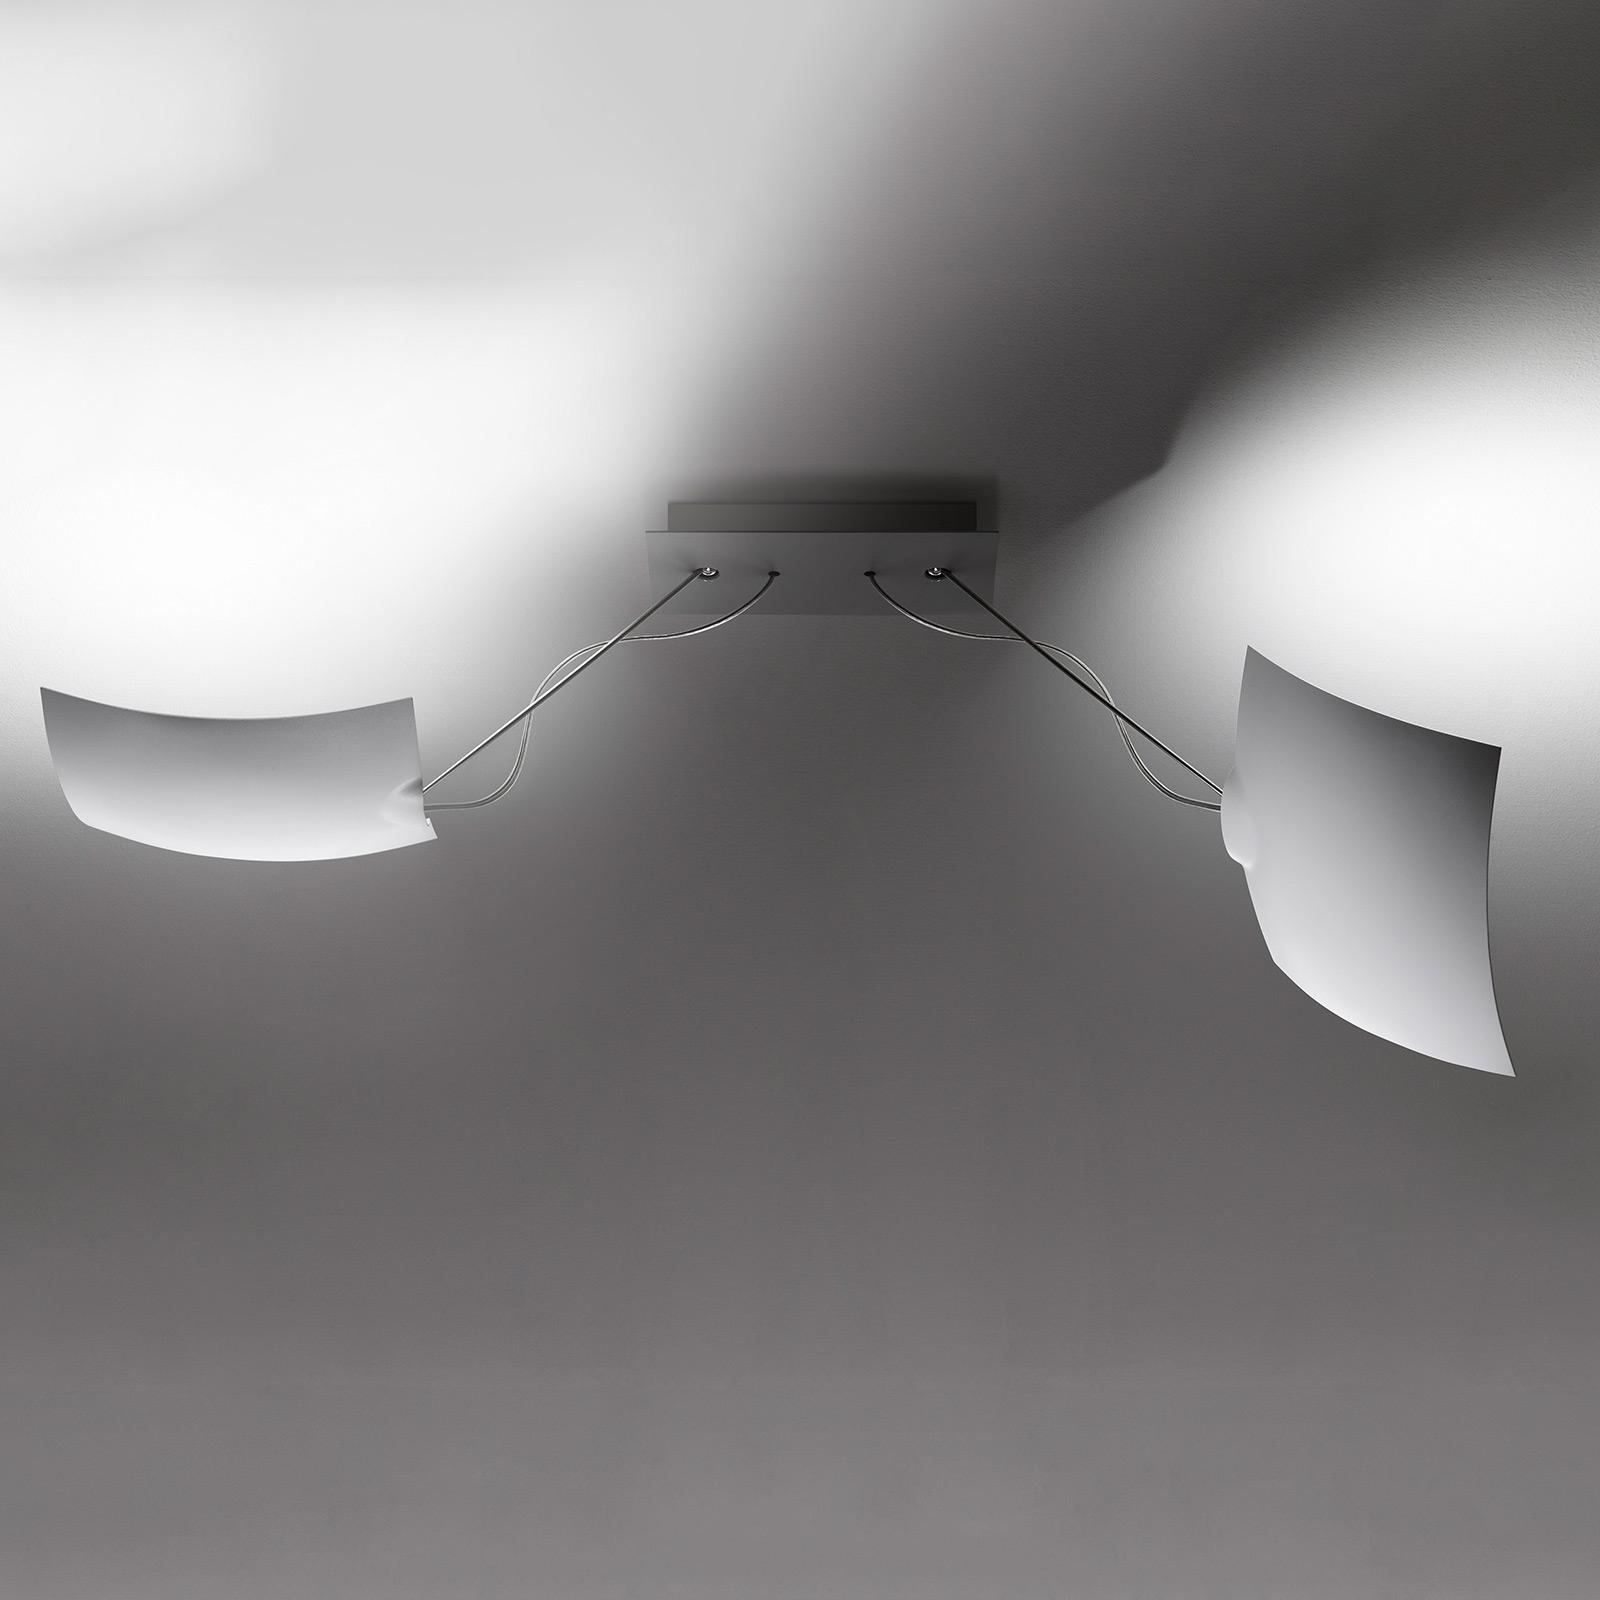 Ingo Maurer 2x18x18 LED plafondlamp, 2-lamps